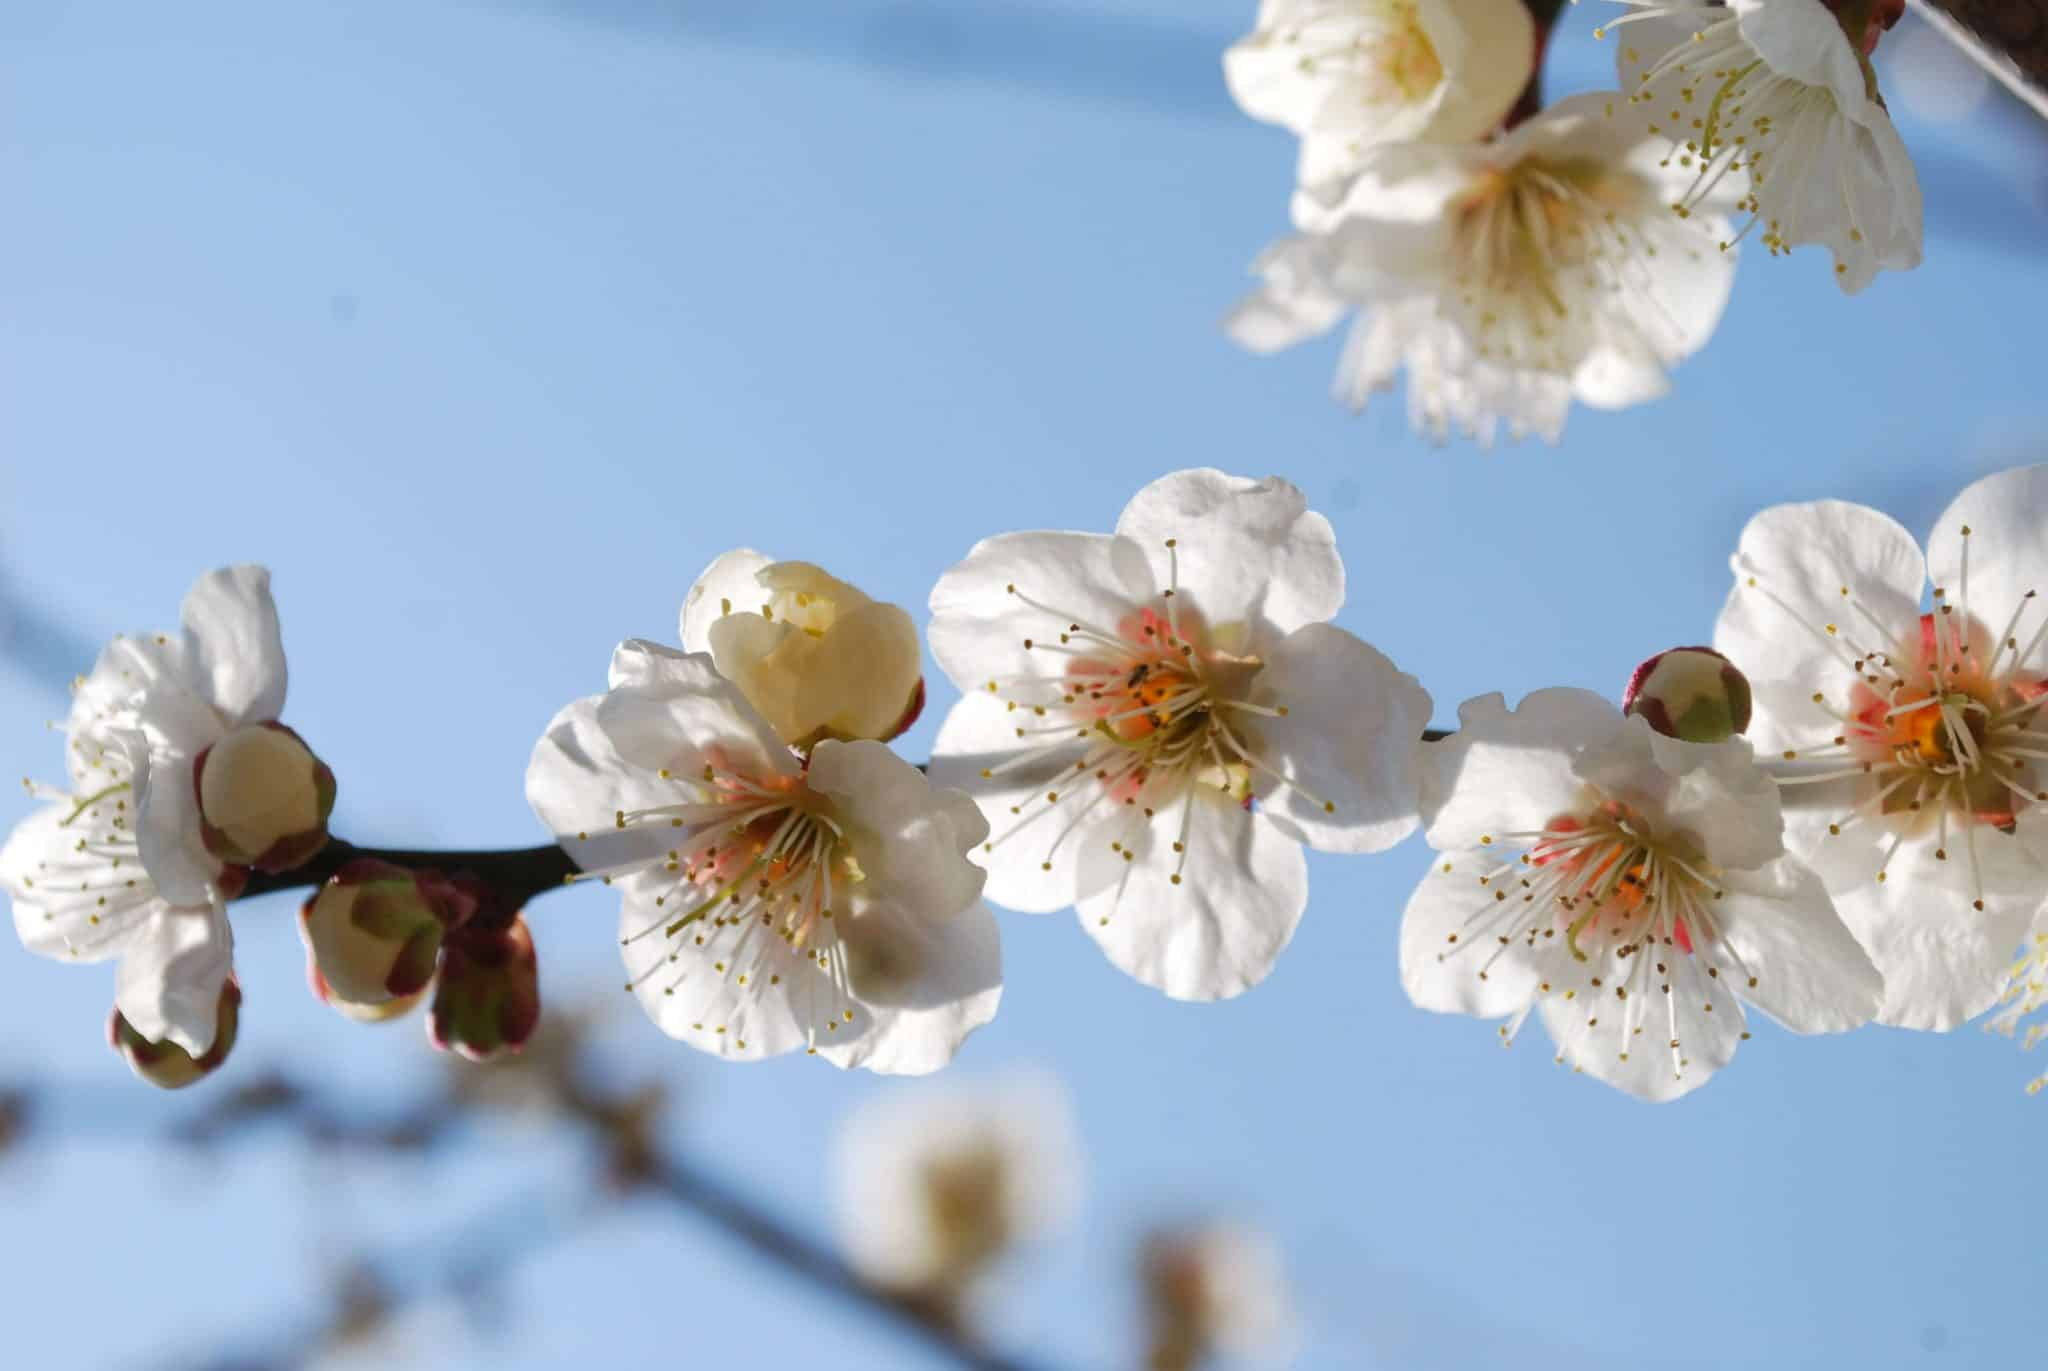 Large Sakura in front of blue sky